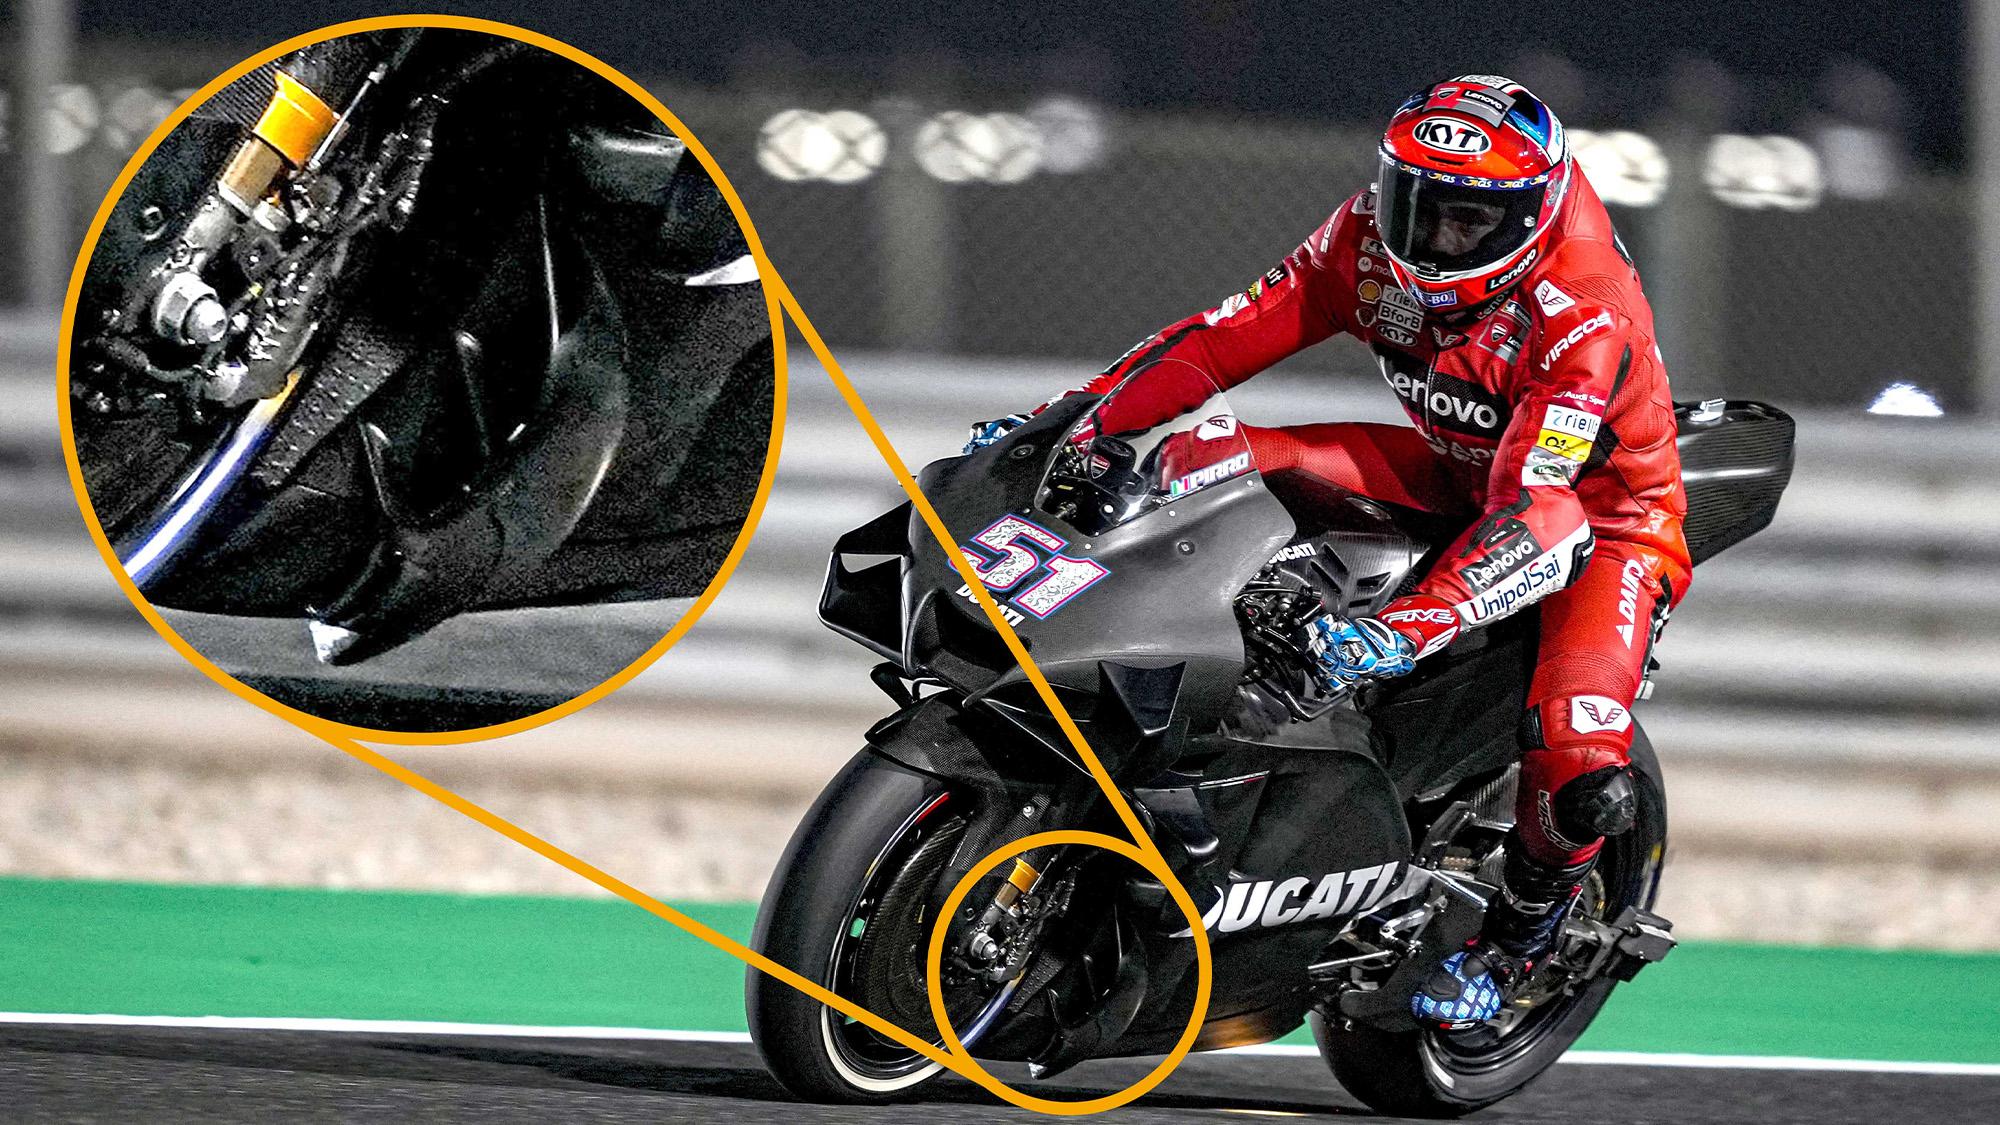 Pirro Ducati aero detail 2021 testing